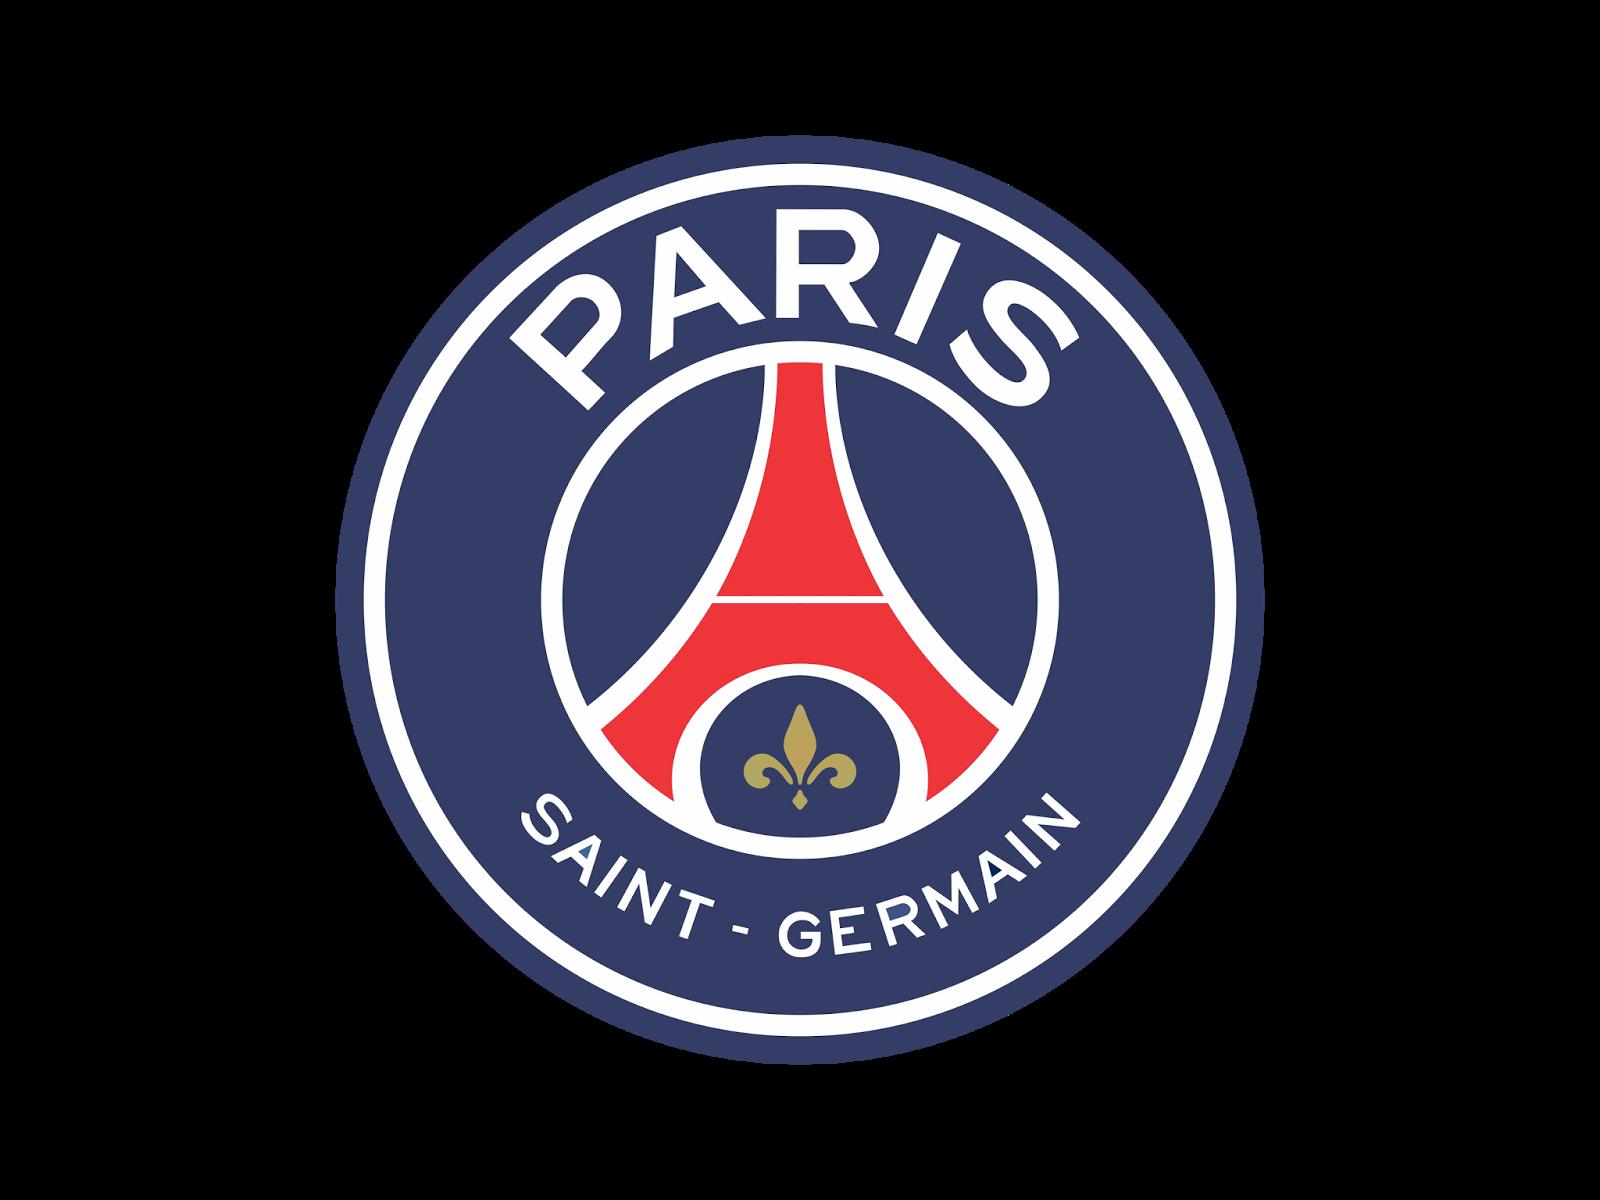 logo paris saint germain format cdr png gudril logo tempat nya download logo cdr. Black Bedroom Furniture Sets. Home Design Ideas